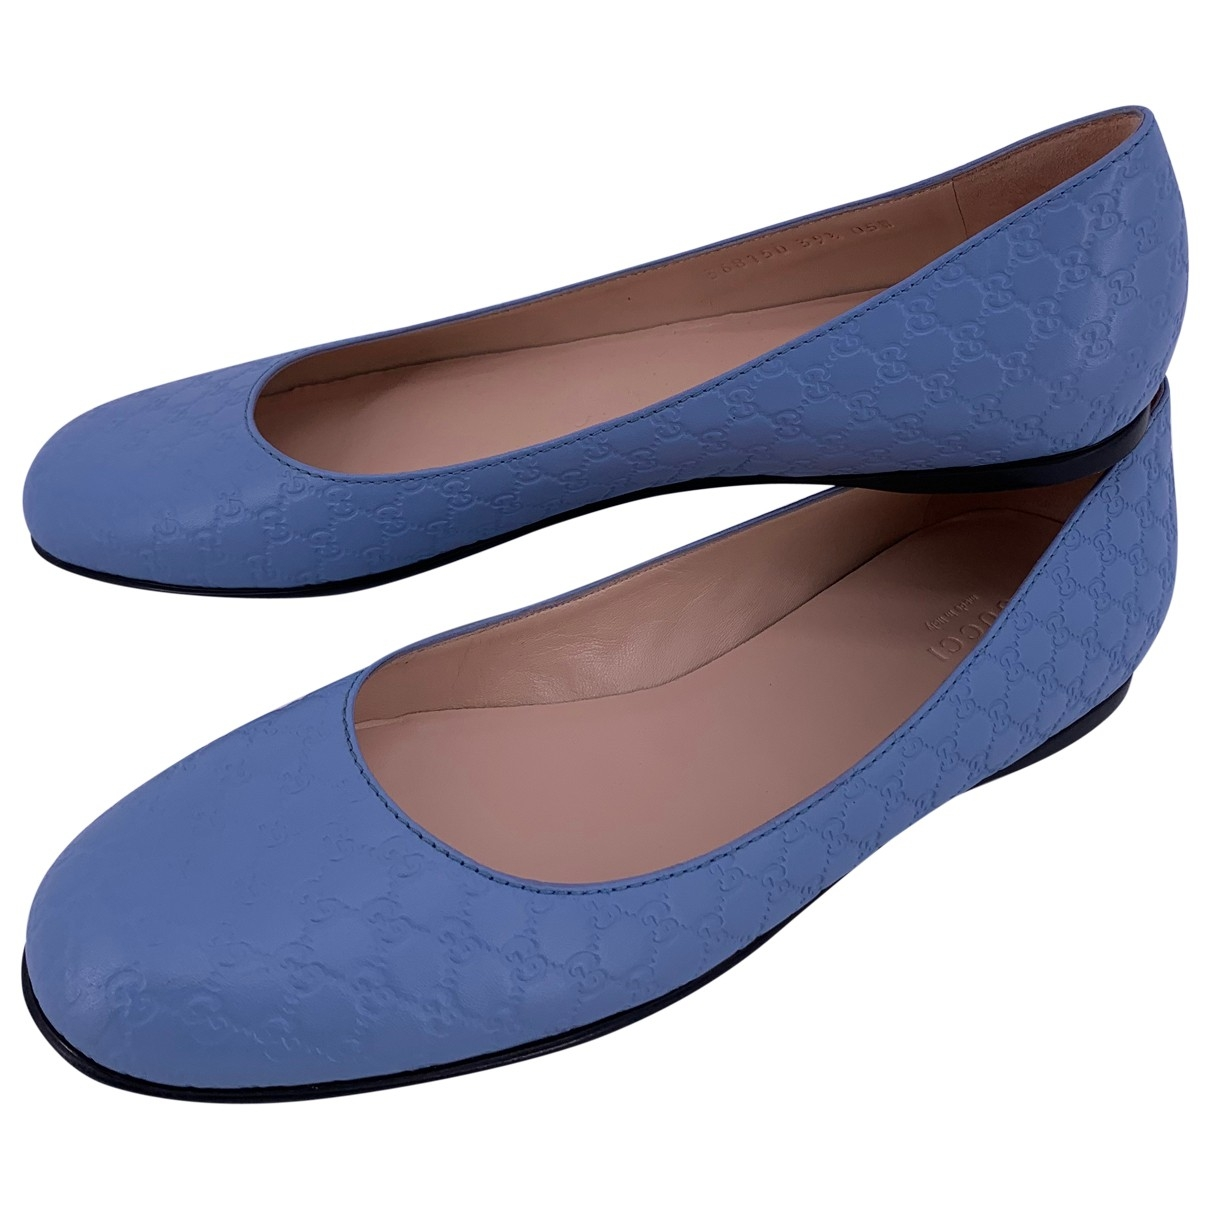 Gucci \N Blue Leather Ballet flats for Women 39.5 EU